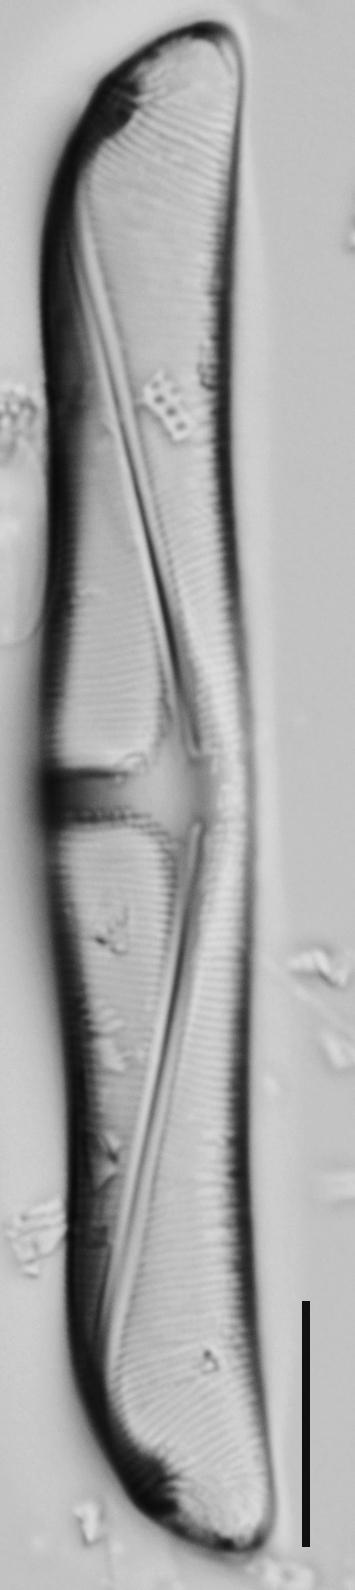 Amphora delphinea minor LM3